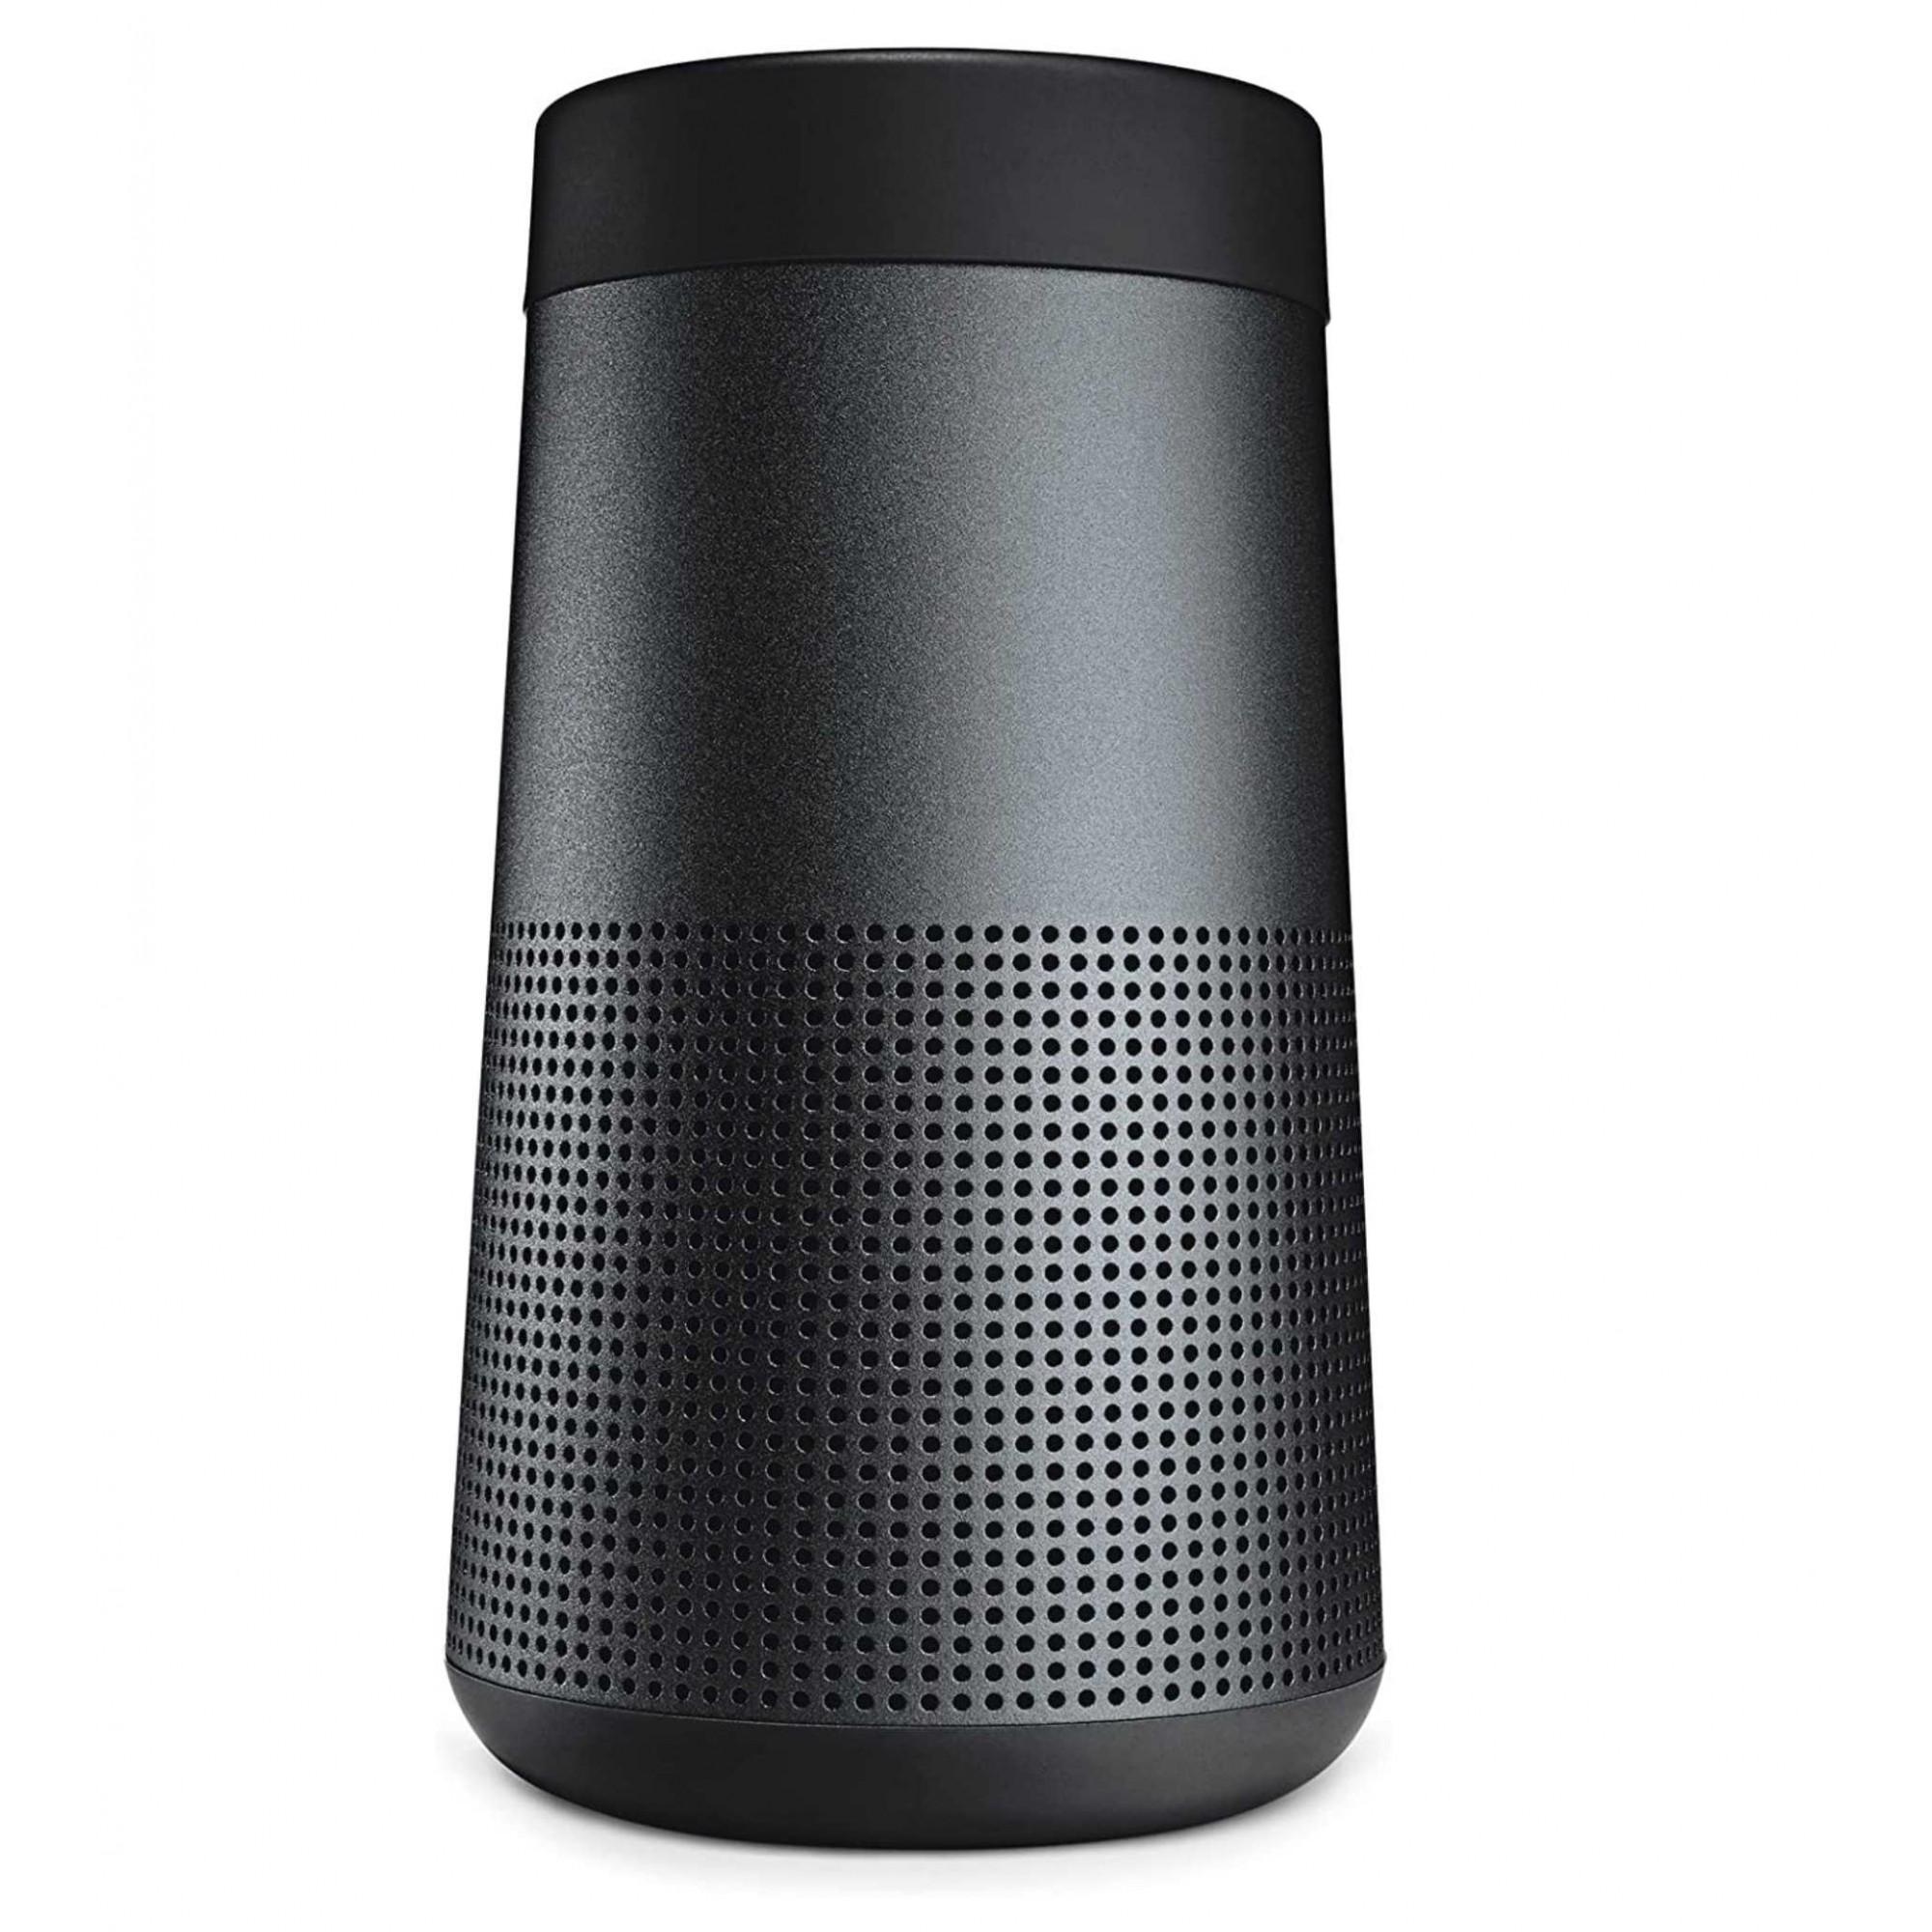 Bose SoundLink Revolve Portátil Bluetooth ( Triple Black )